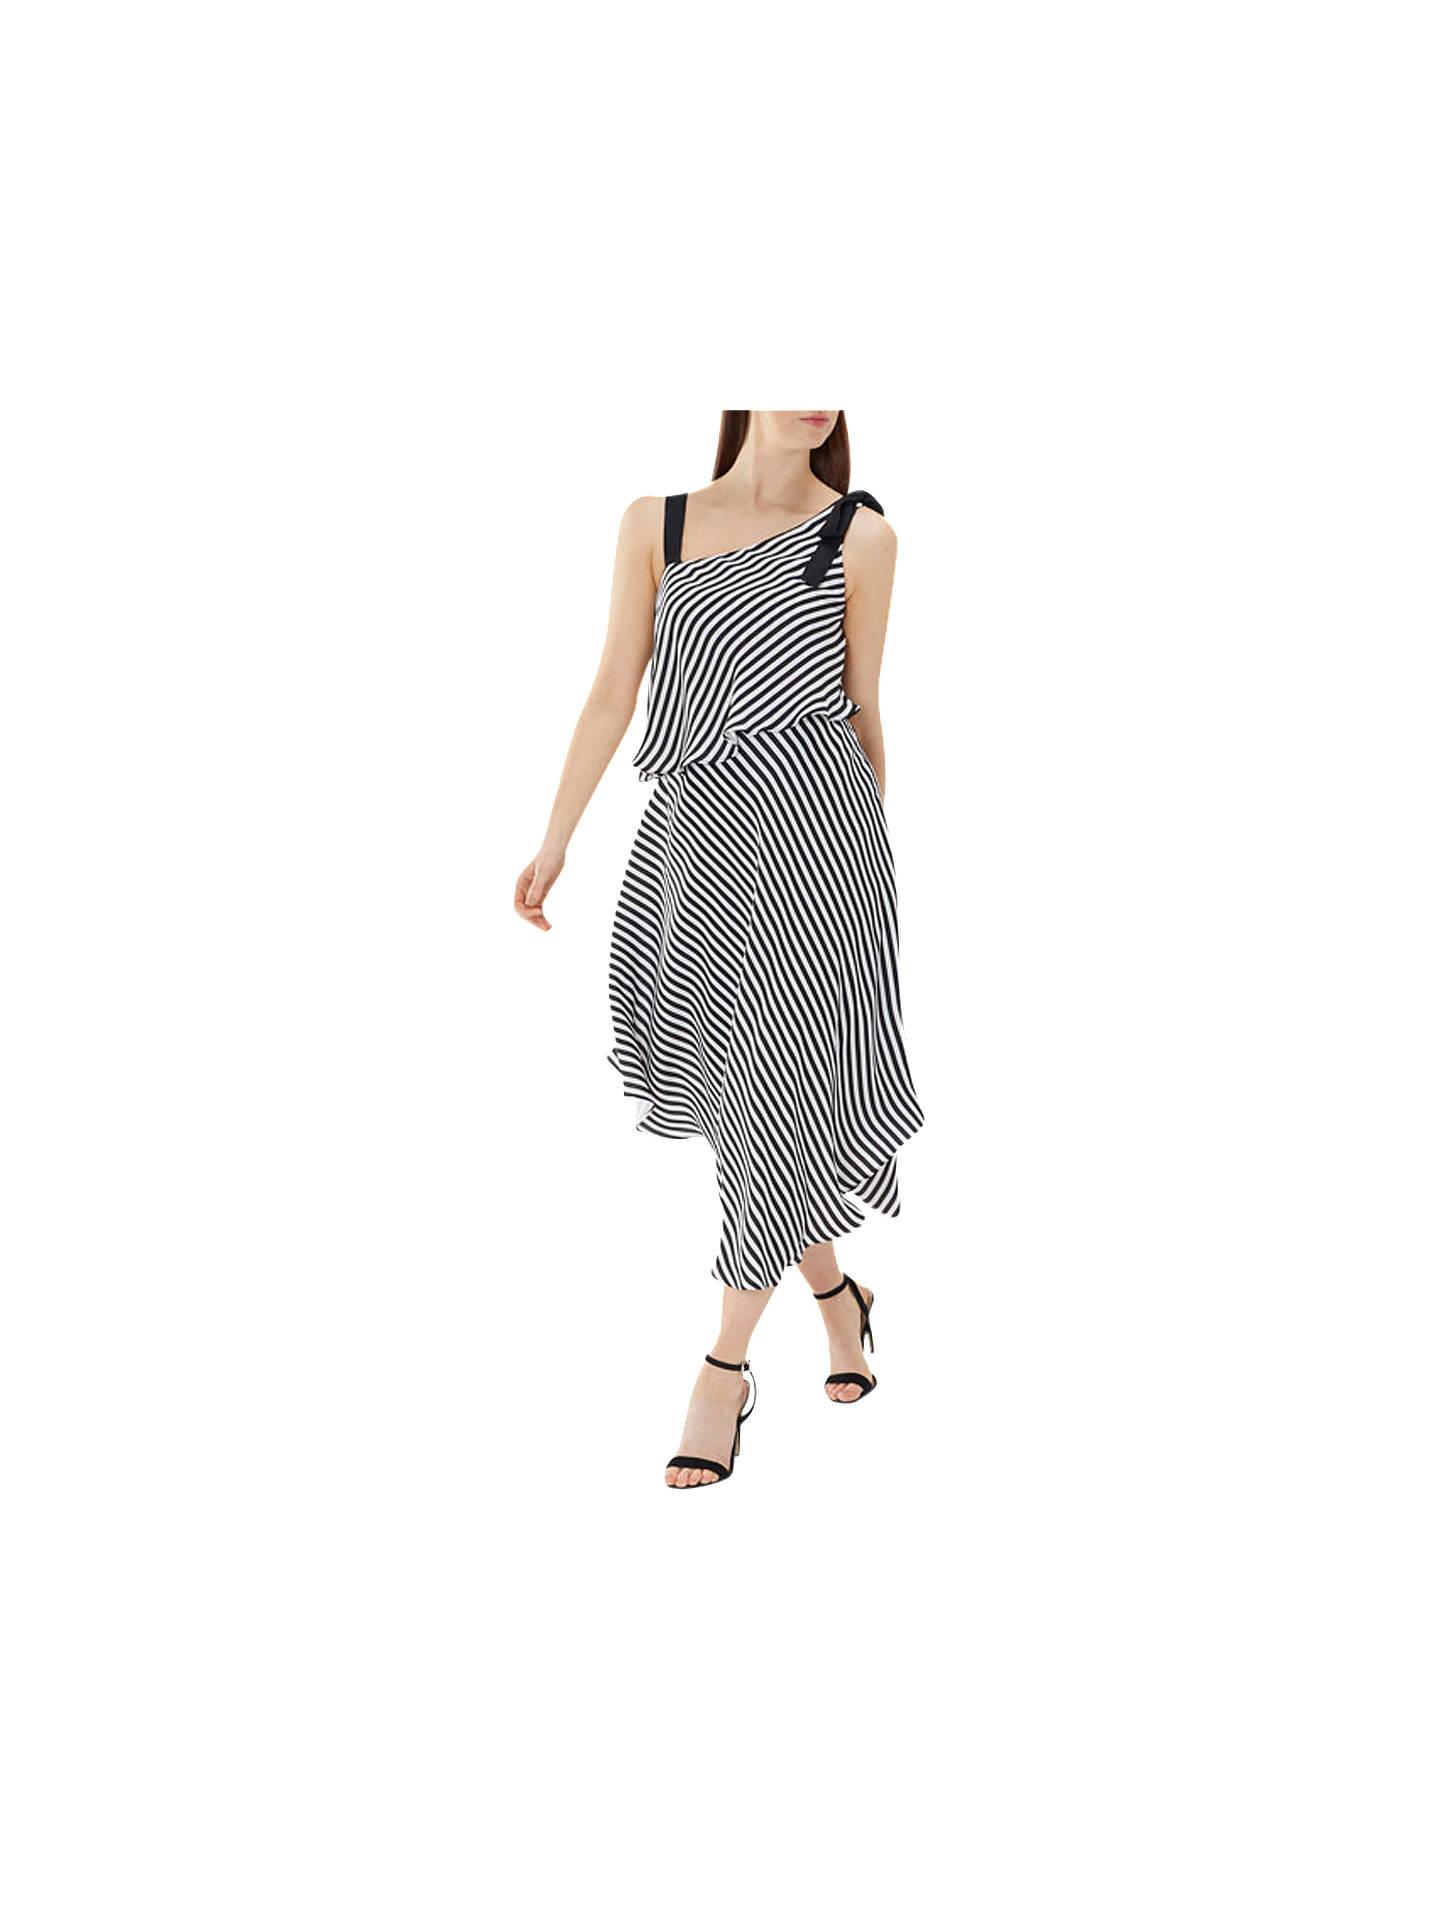 Black White Striped Dress Size 6 8 10 12 14 16 lightweight Dresses Stripes